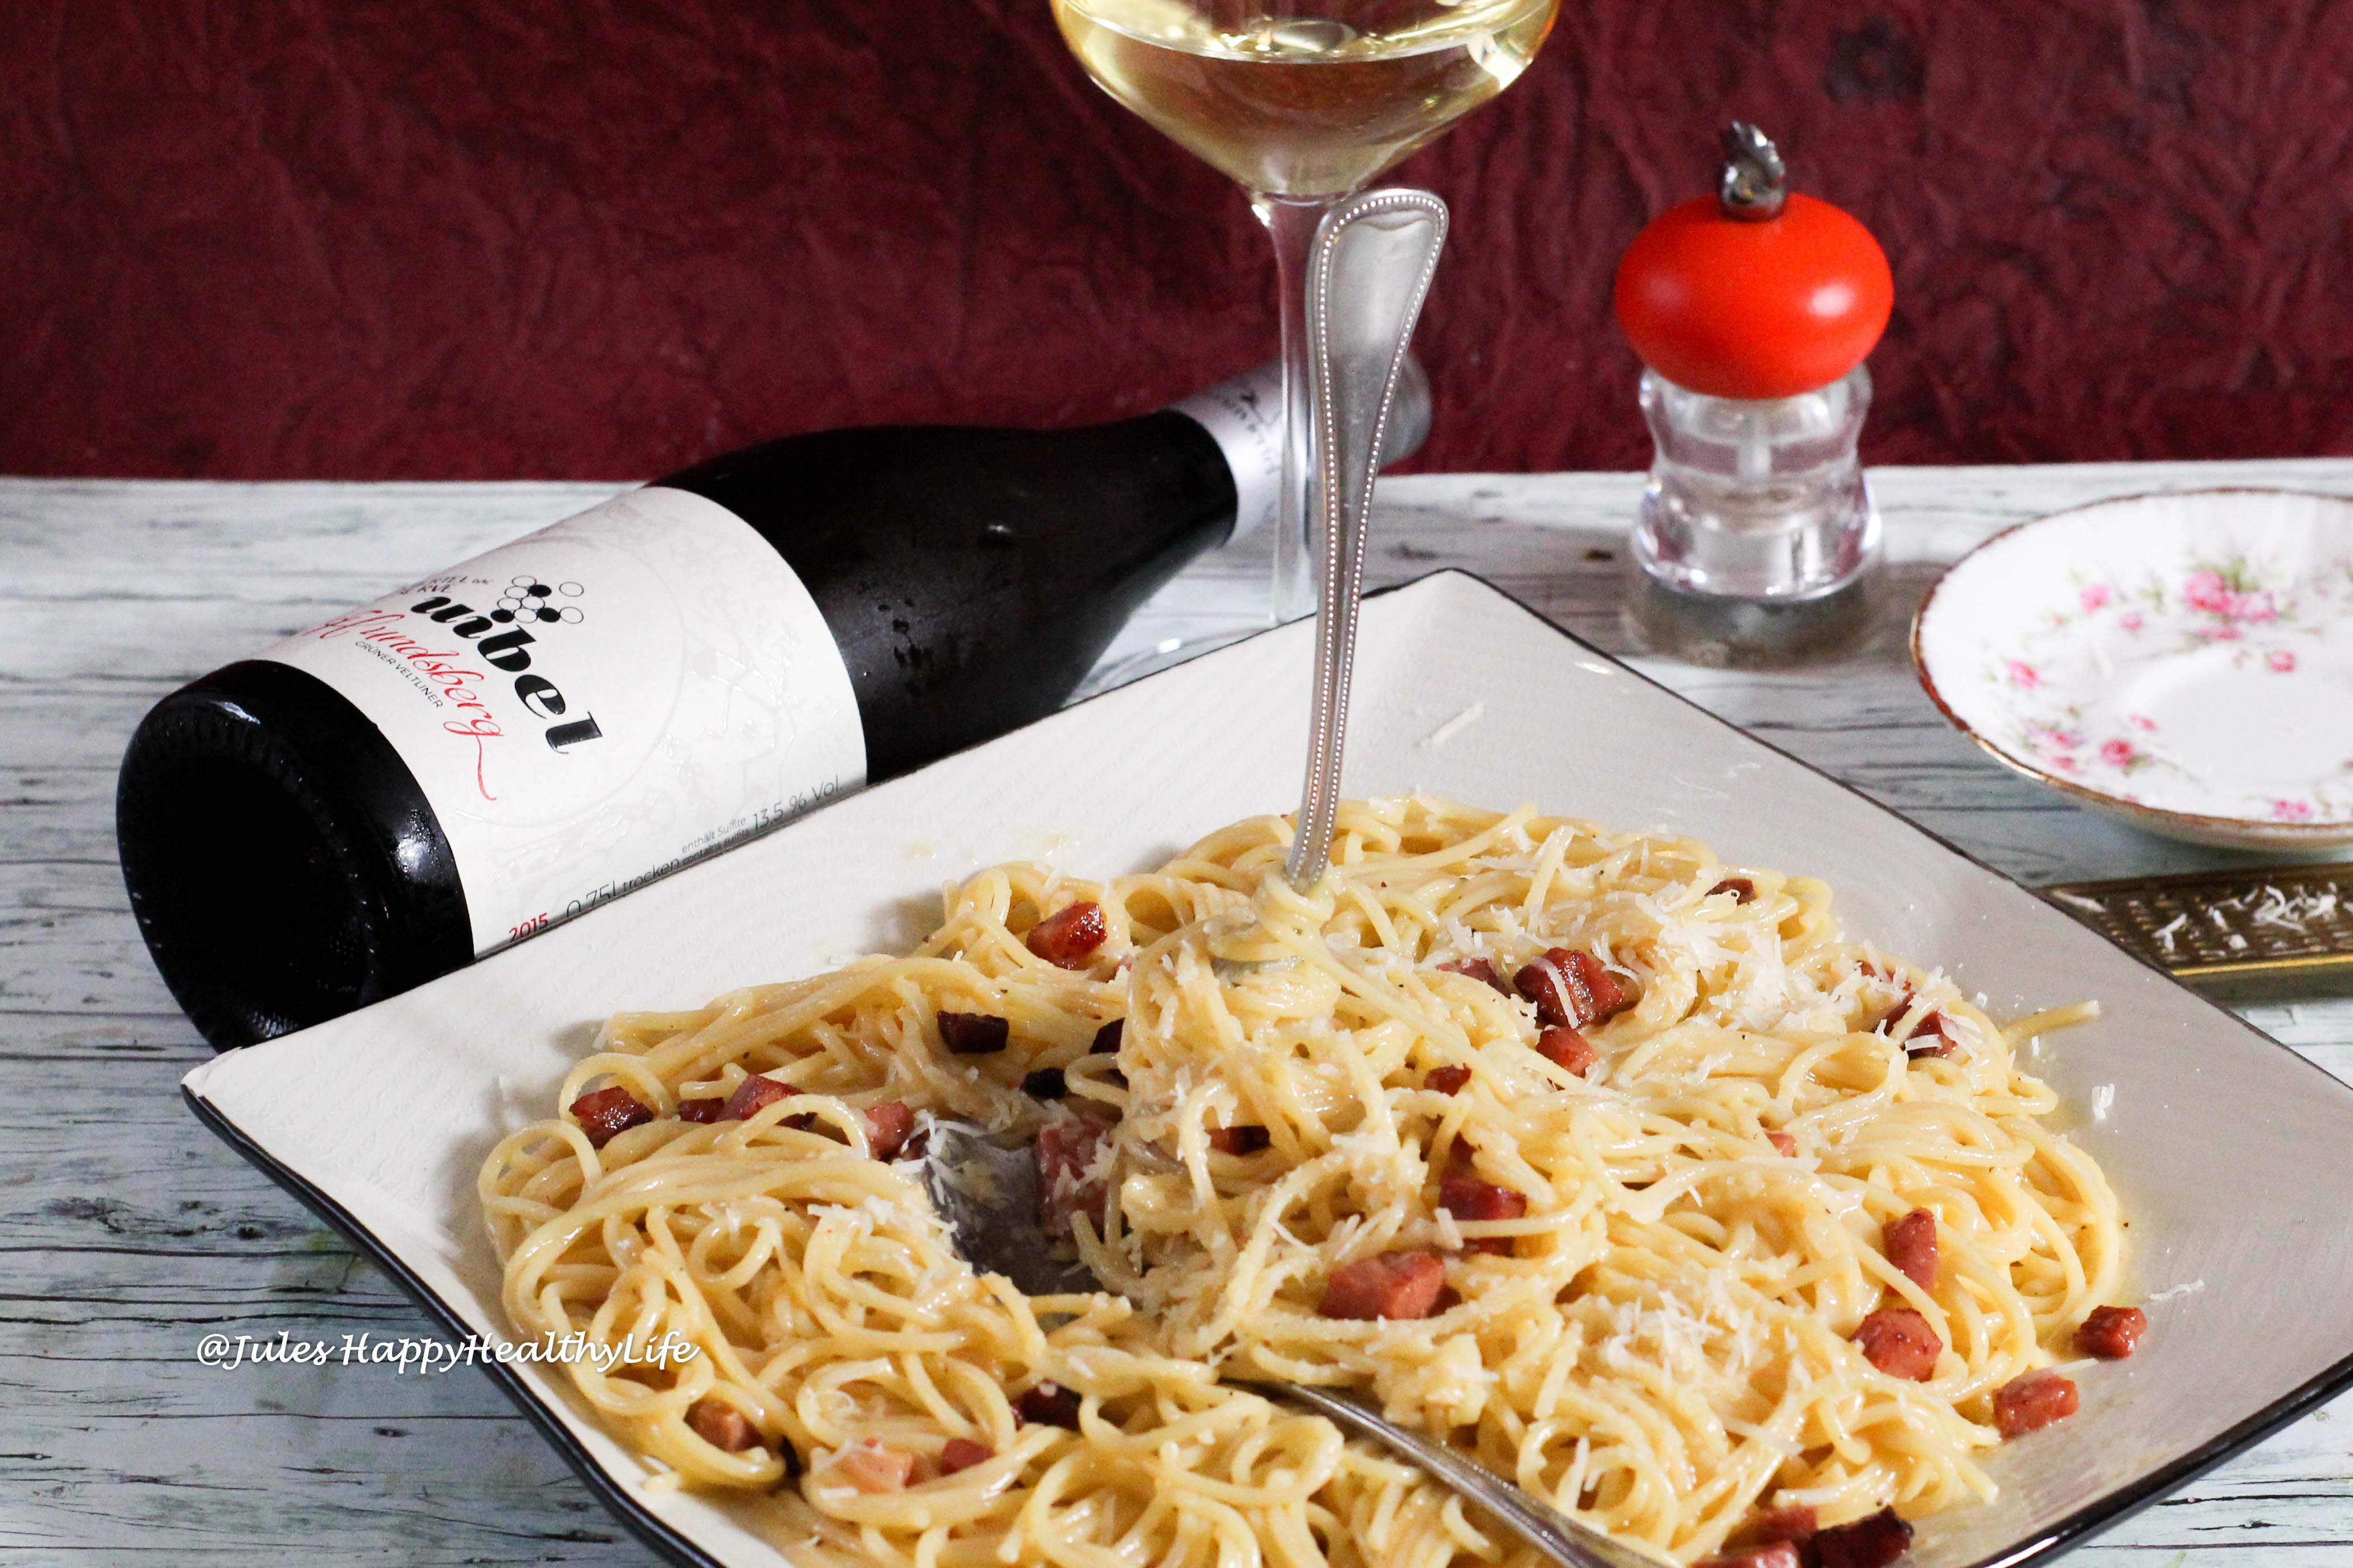 Spaghetti Carbonara dazu Hundsberg Grüner Veltliner 2015 vom Weinhau Uibel